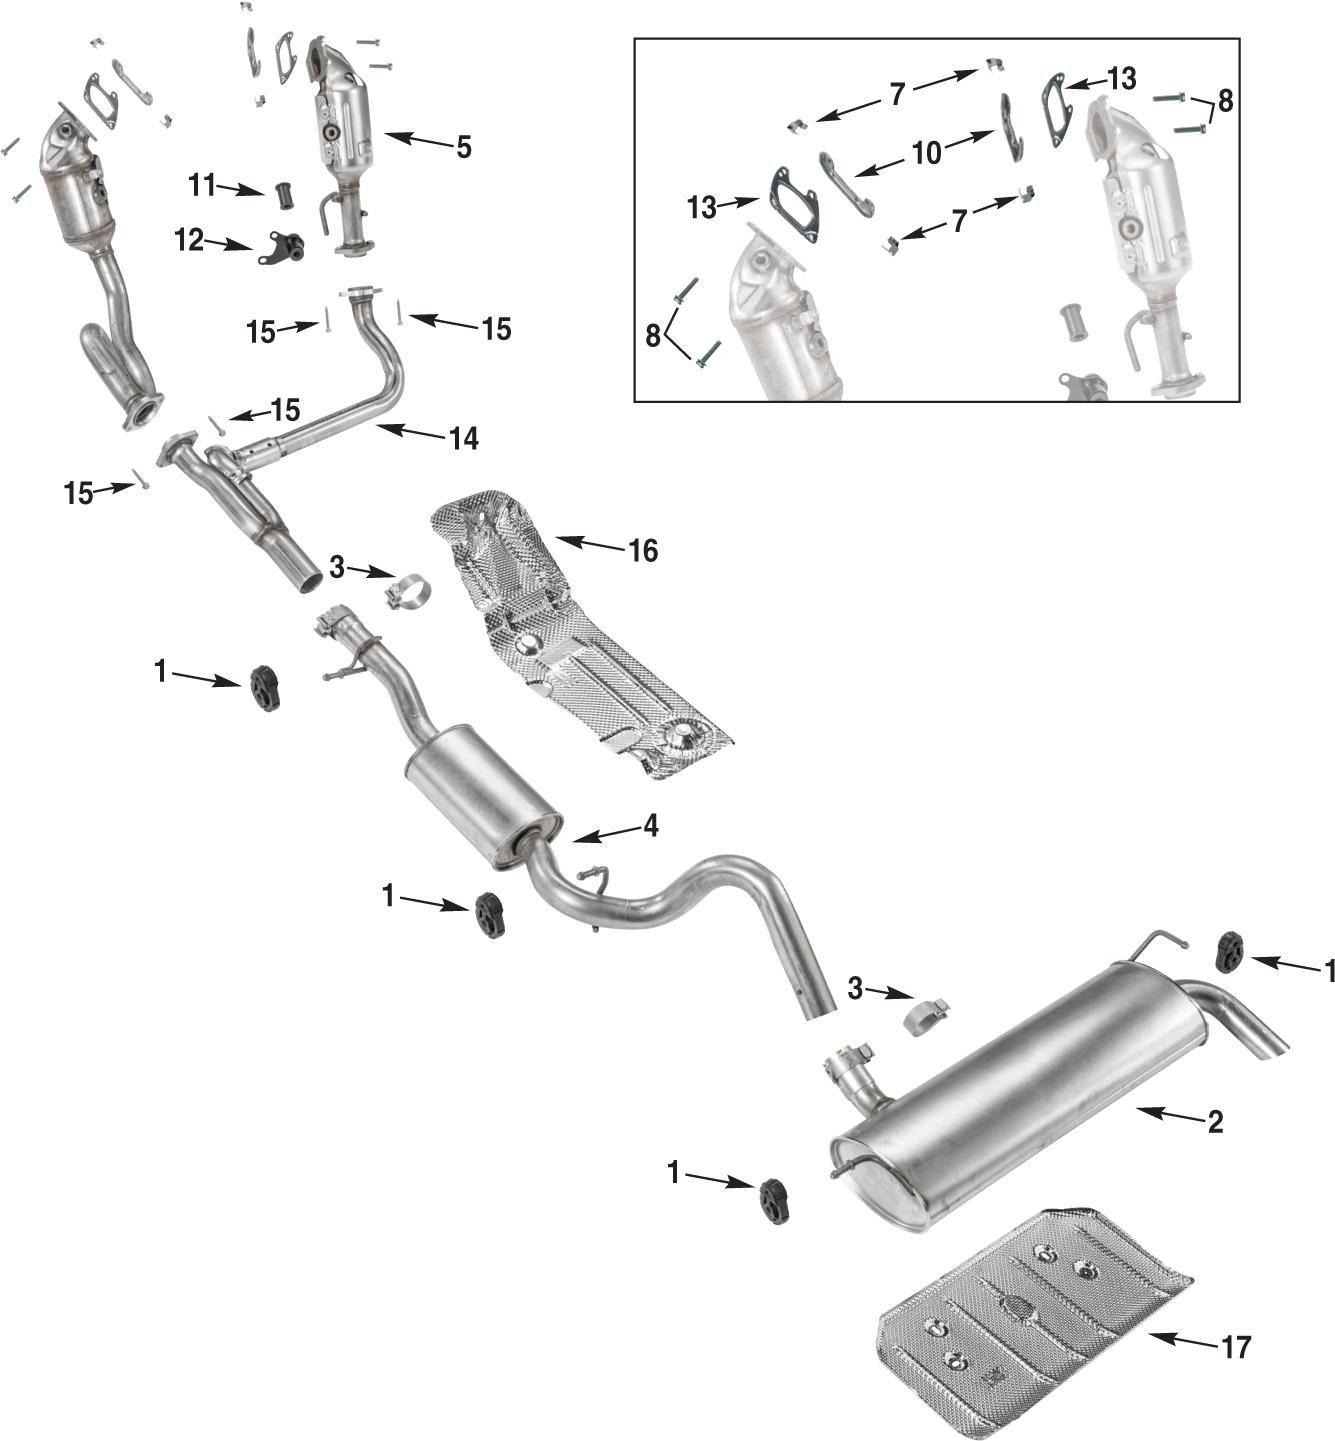 jeep exhaust diagram wiring diagram blog 2012 jeep wrangler exhaust diagram jeep exhaust diagram [ 1335 x 1441 Pixel ]